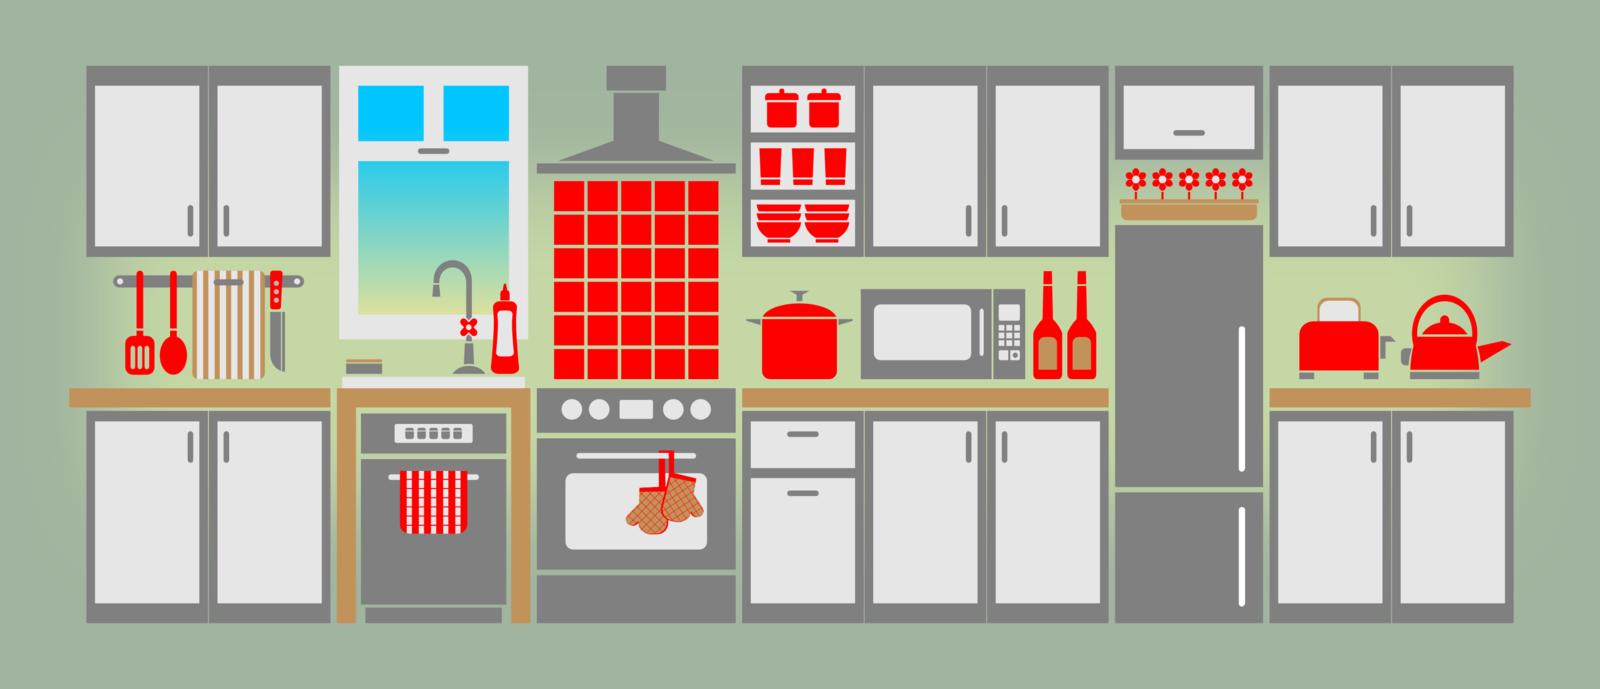 Kitchen clipart kitchen room Kid 2 free images art